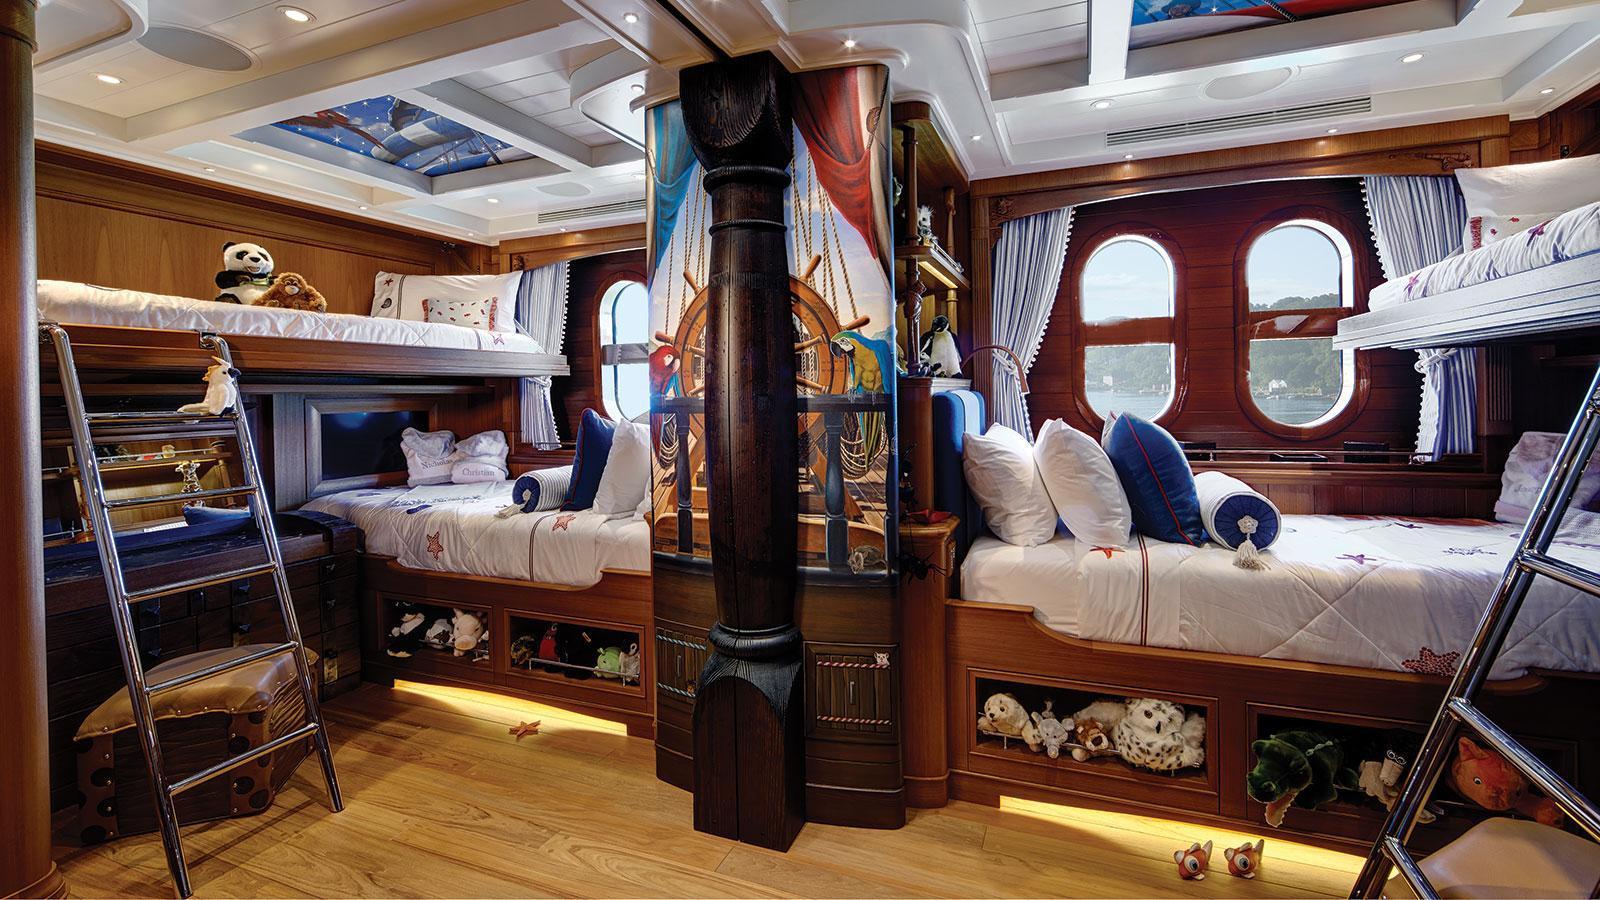 sea-owl-motor-yacht-feadship-2013-62m-children-cabin